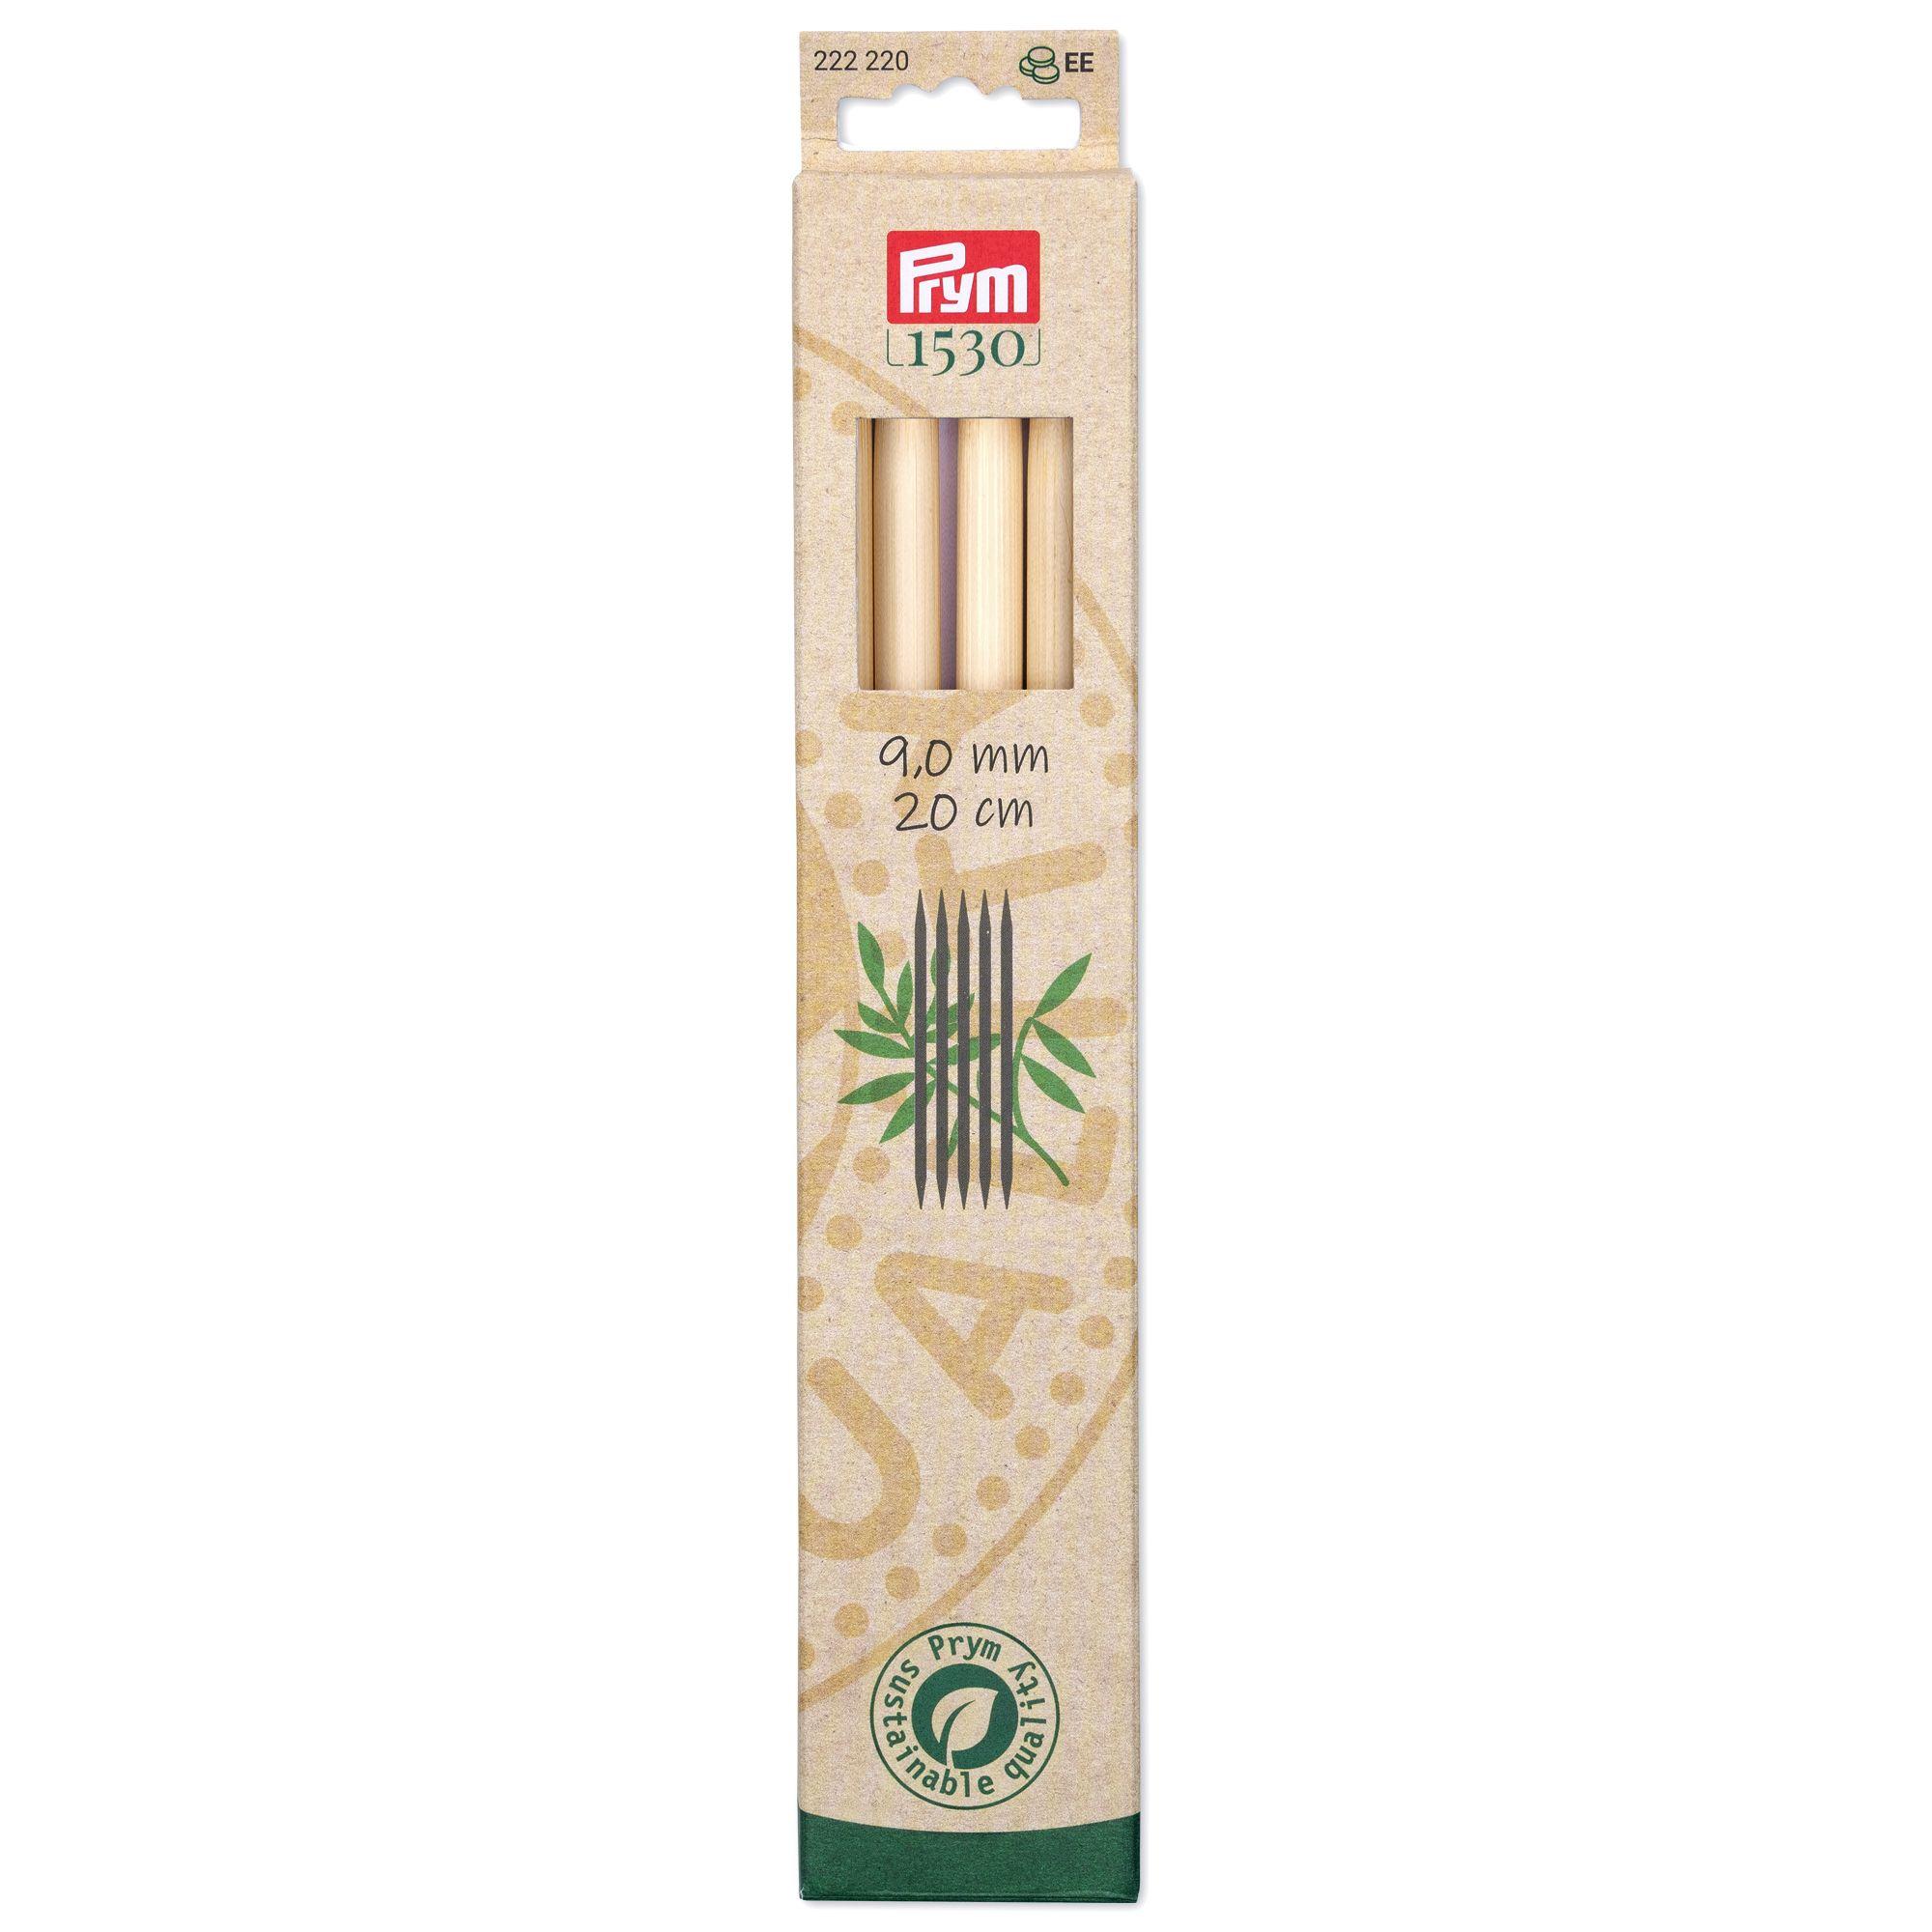 Prym 222220 Strumpfstricknadeln Bambus